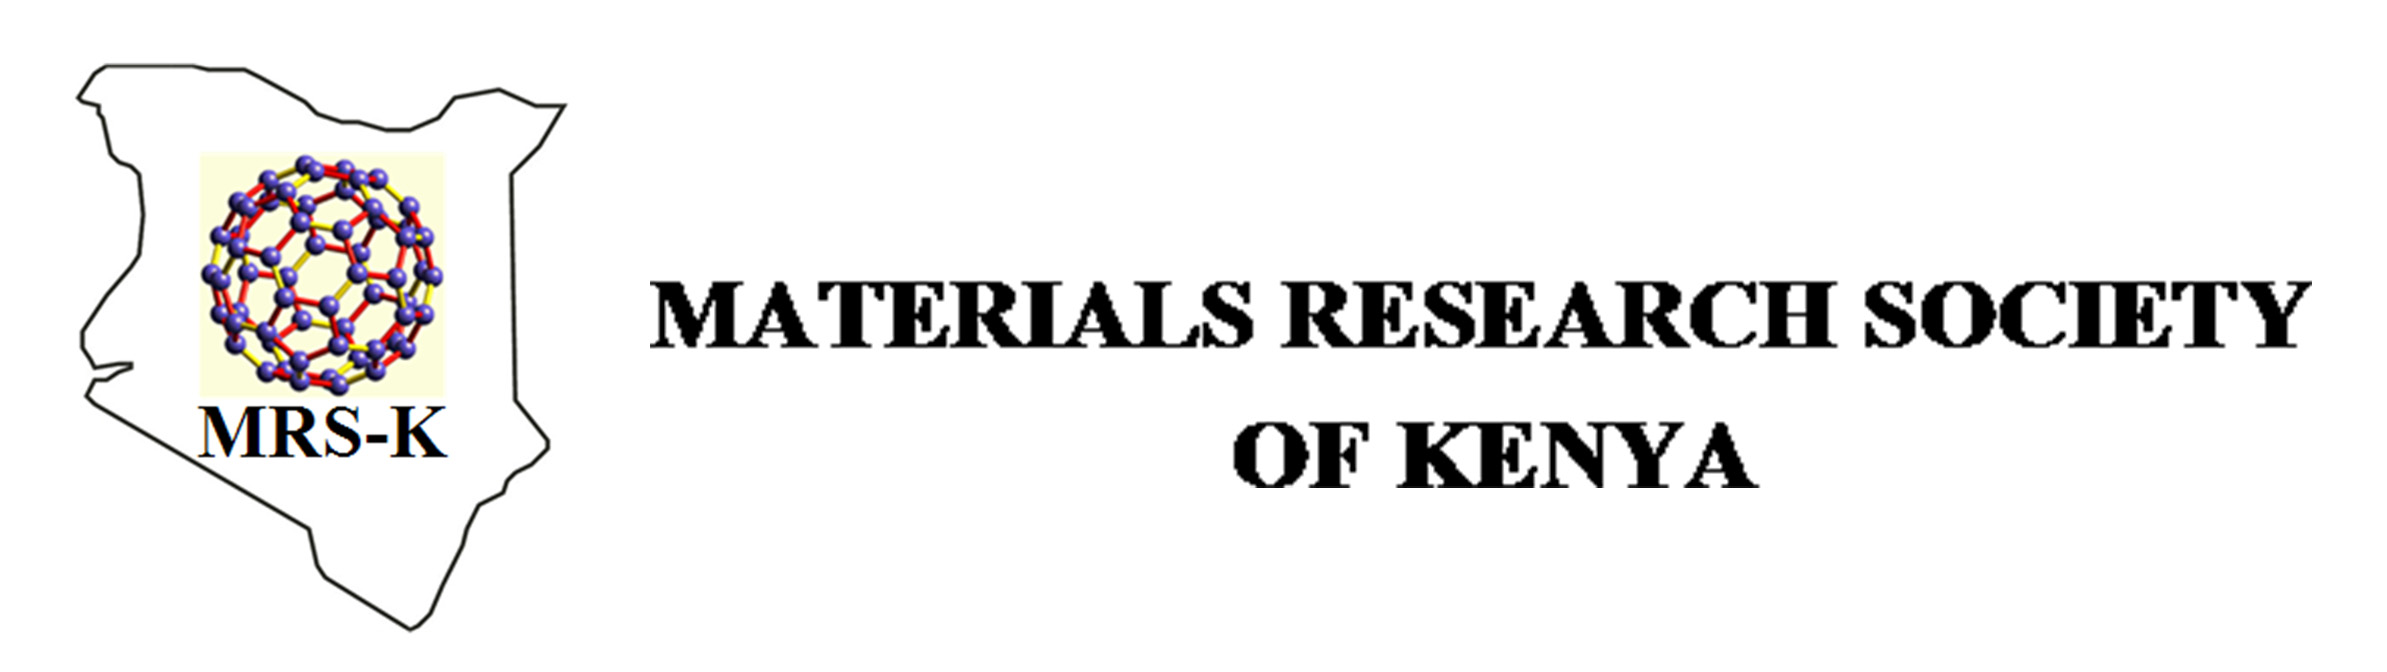 The Materials Research Society of Kenya